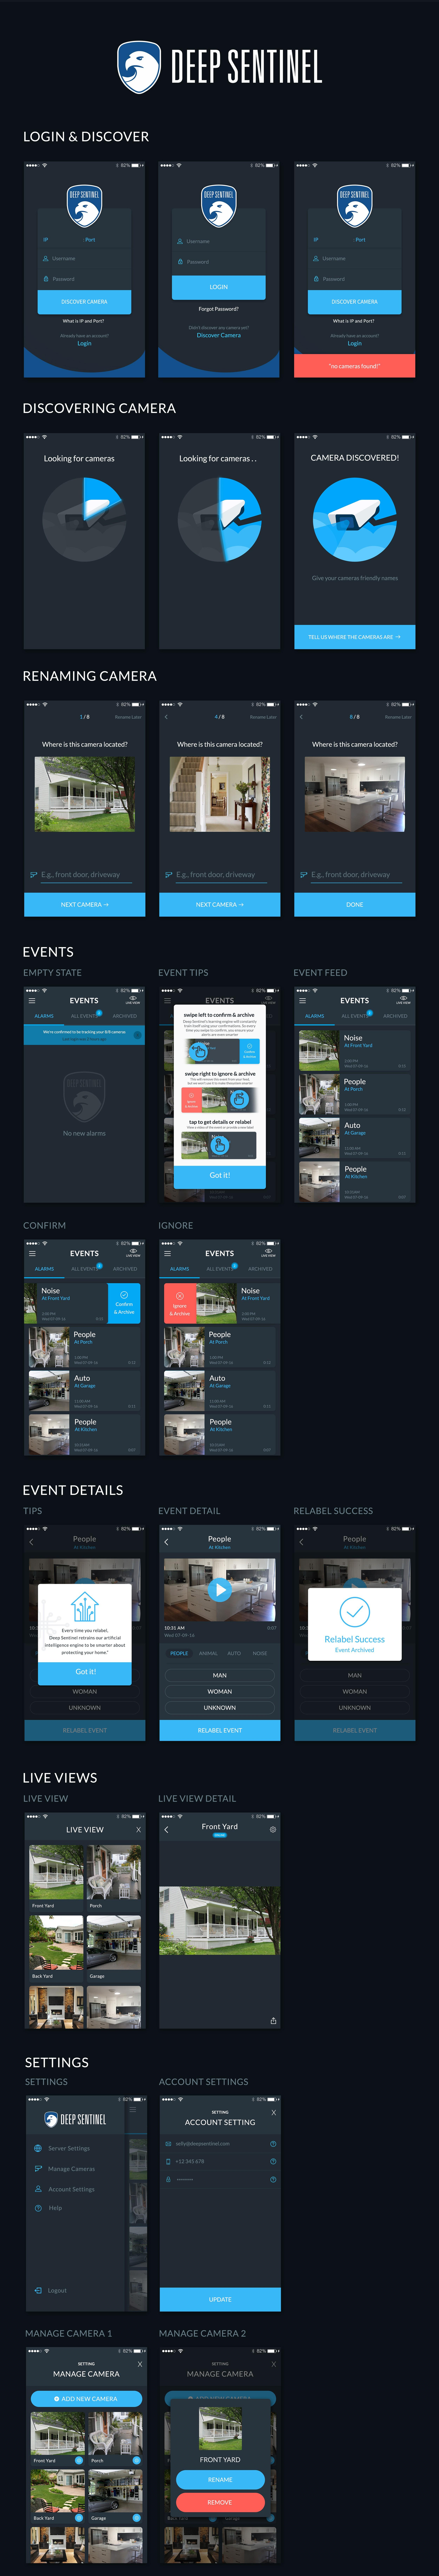 Deep Sentinel Mobile app